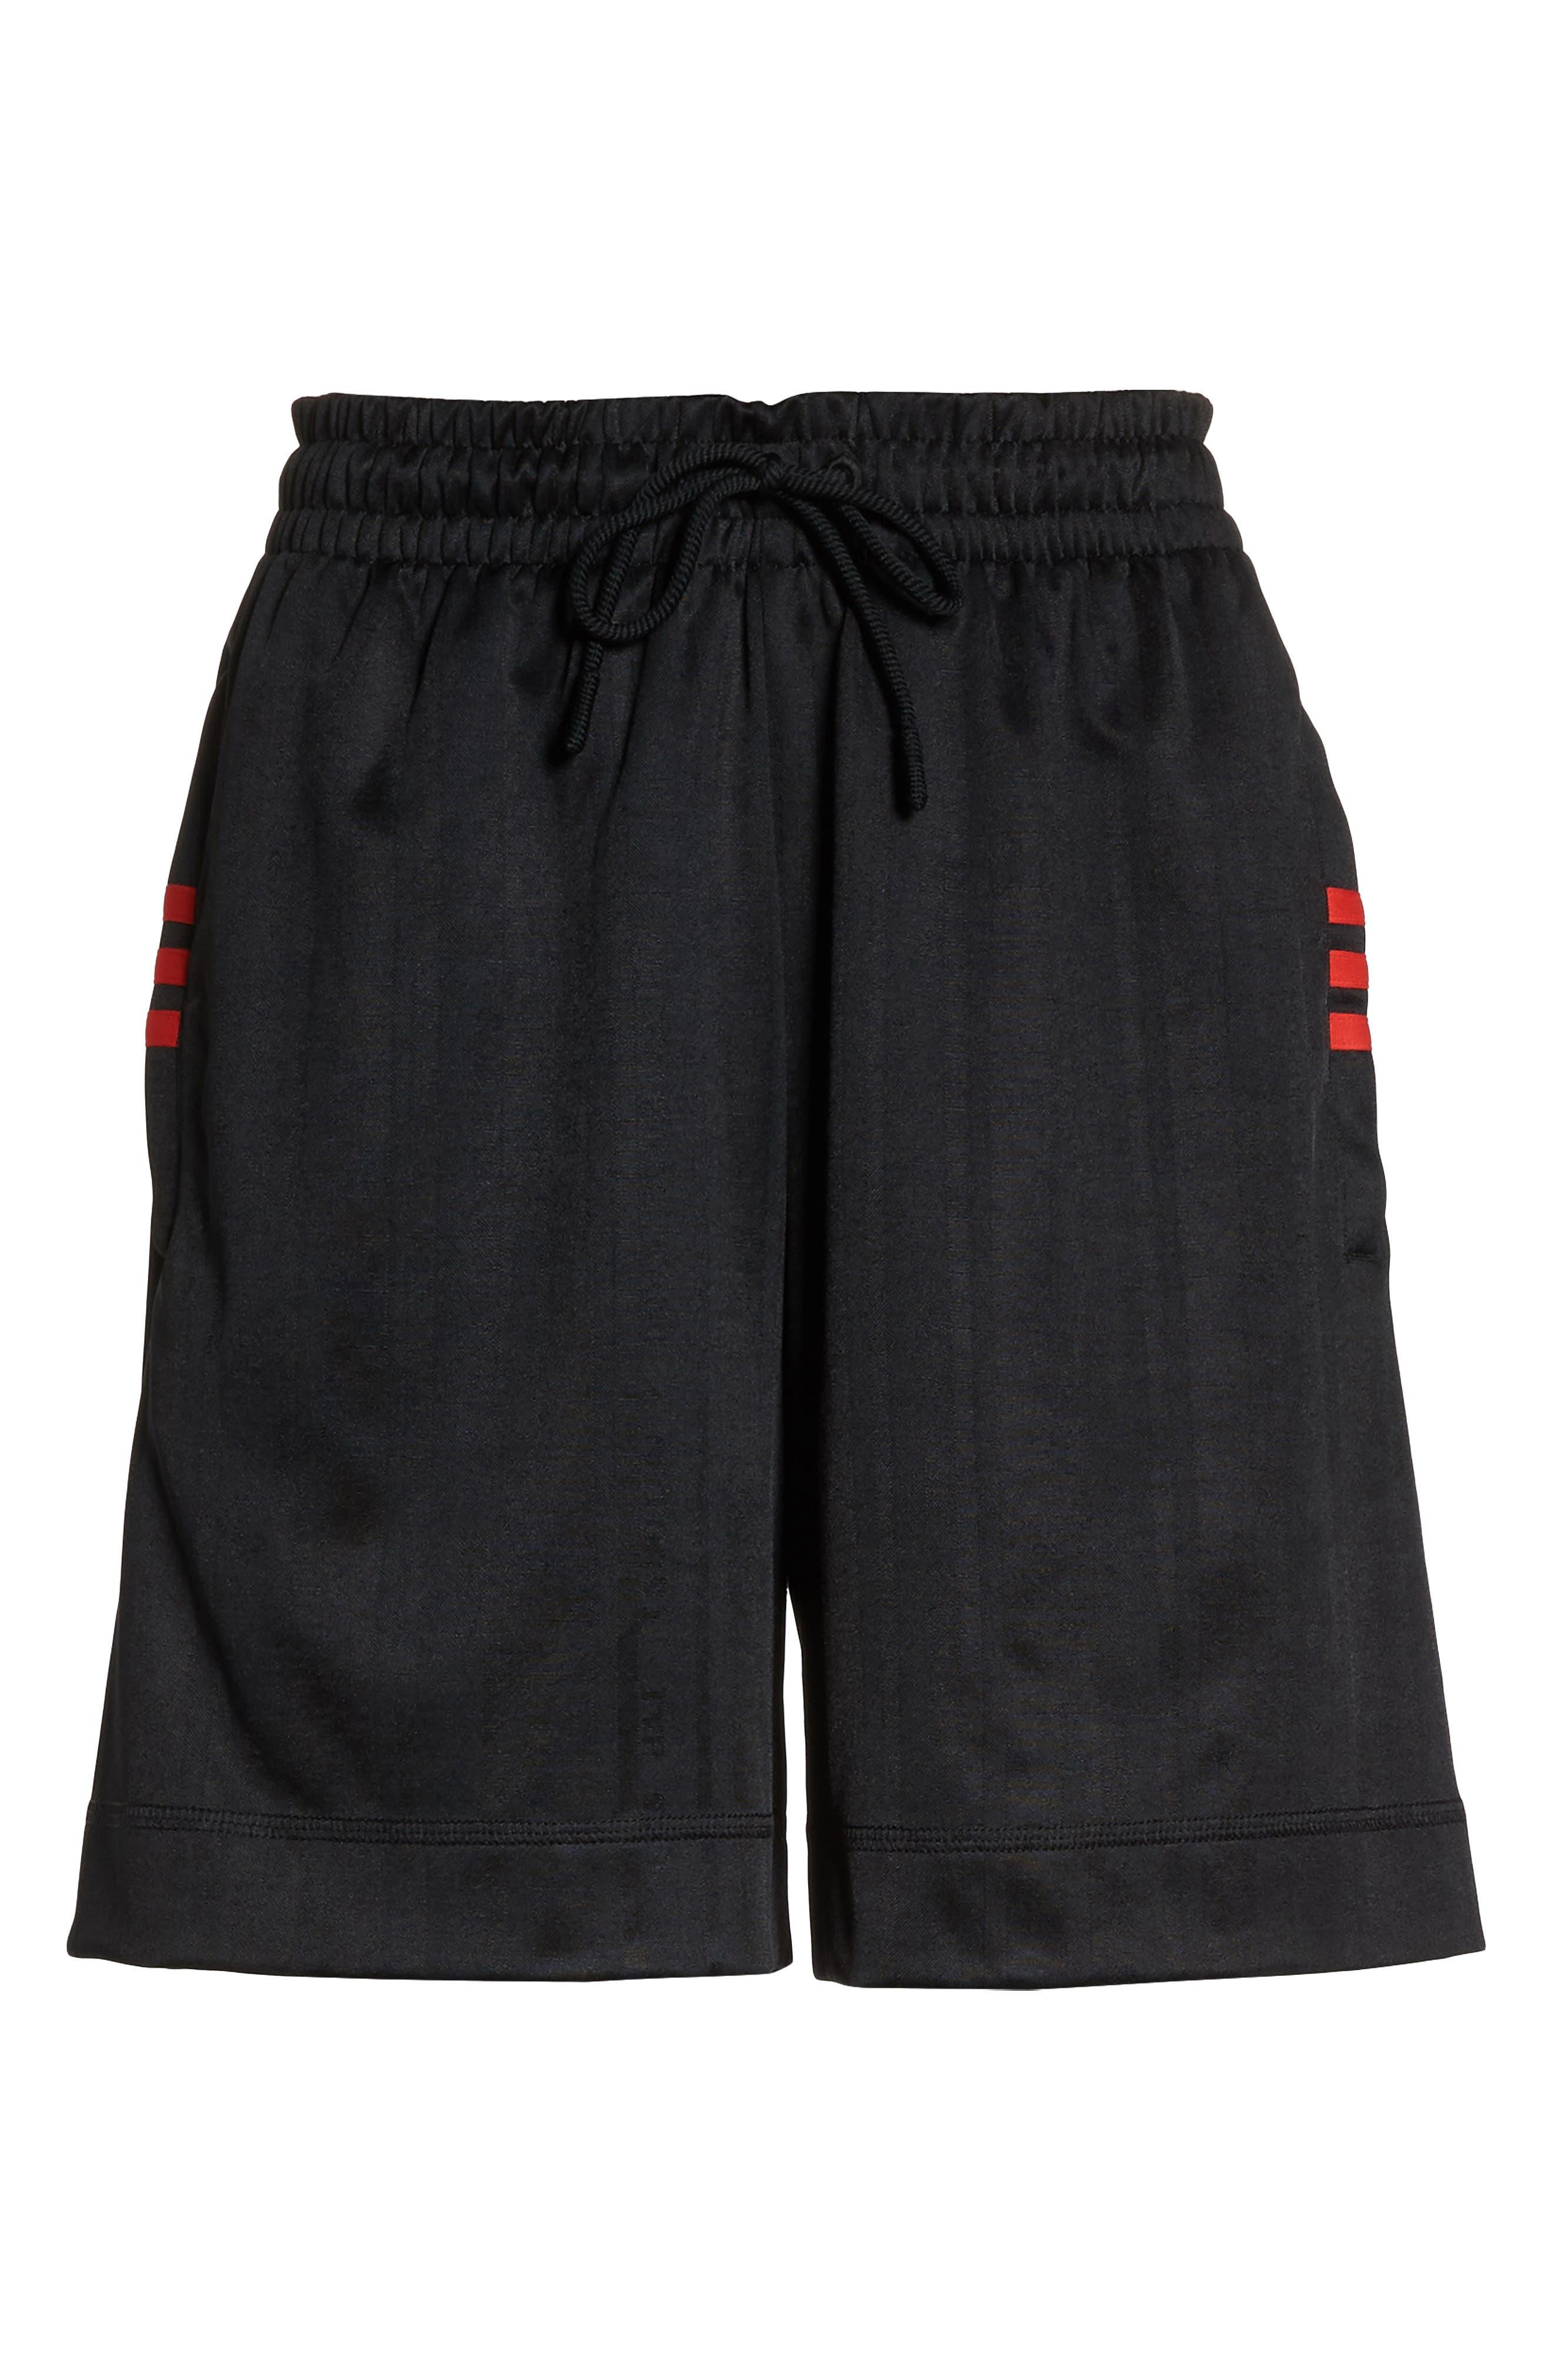 Soccer Shorts,                             Alternate thumbnail 7, color,                             BLACK/ CORE RED